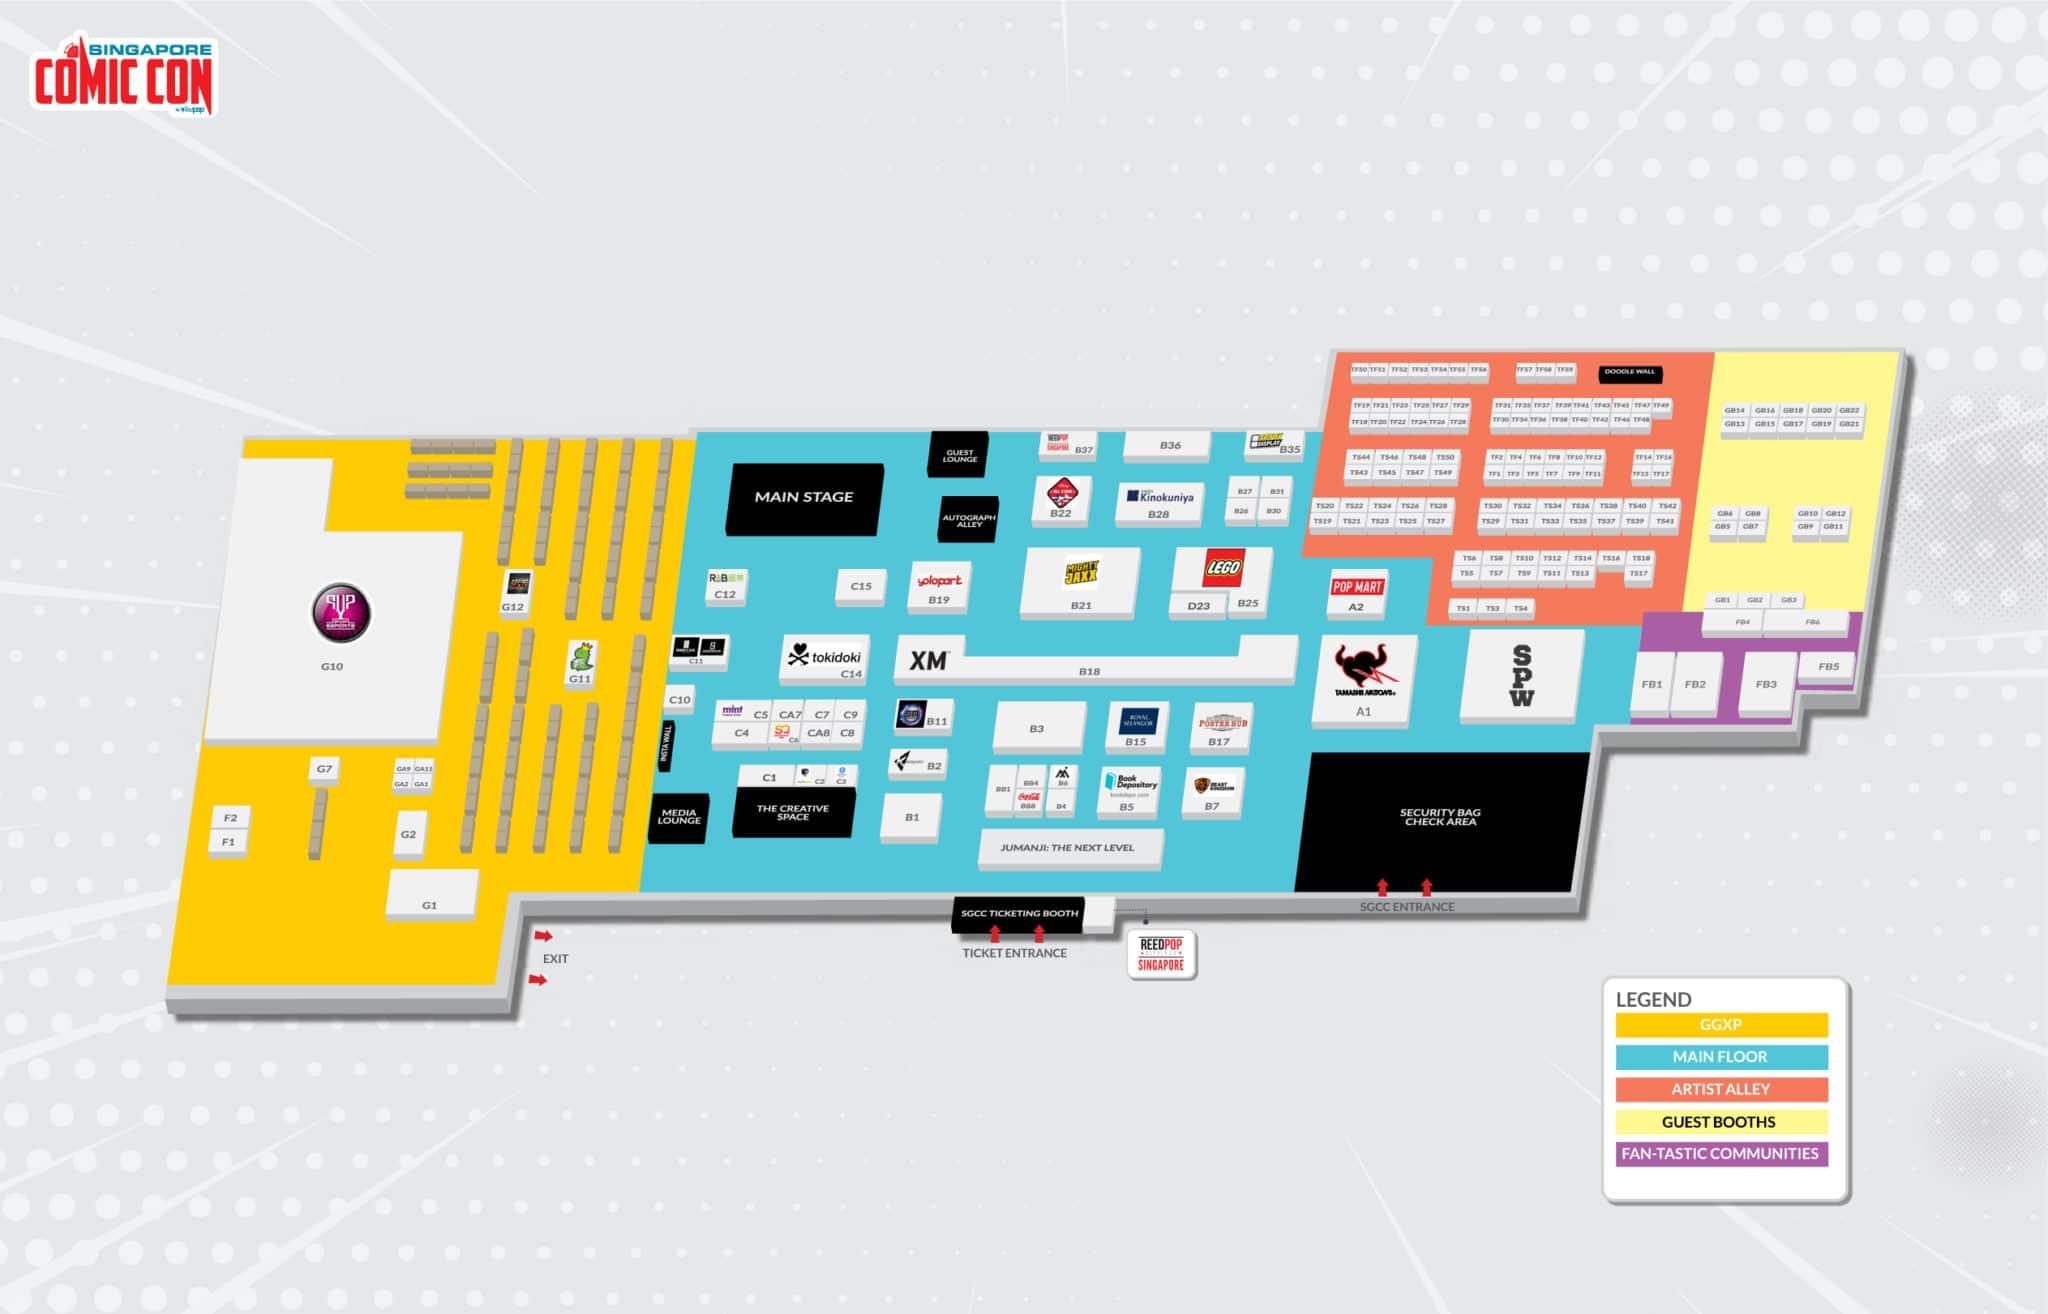 Singapore Comic Con 2019 Floorplan